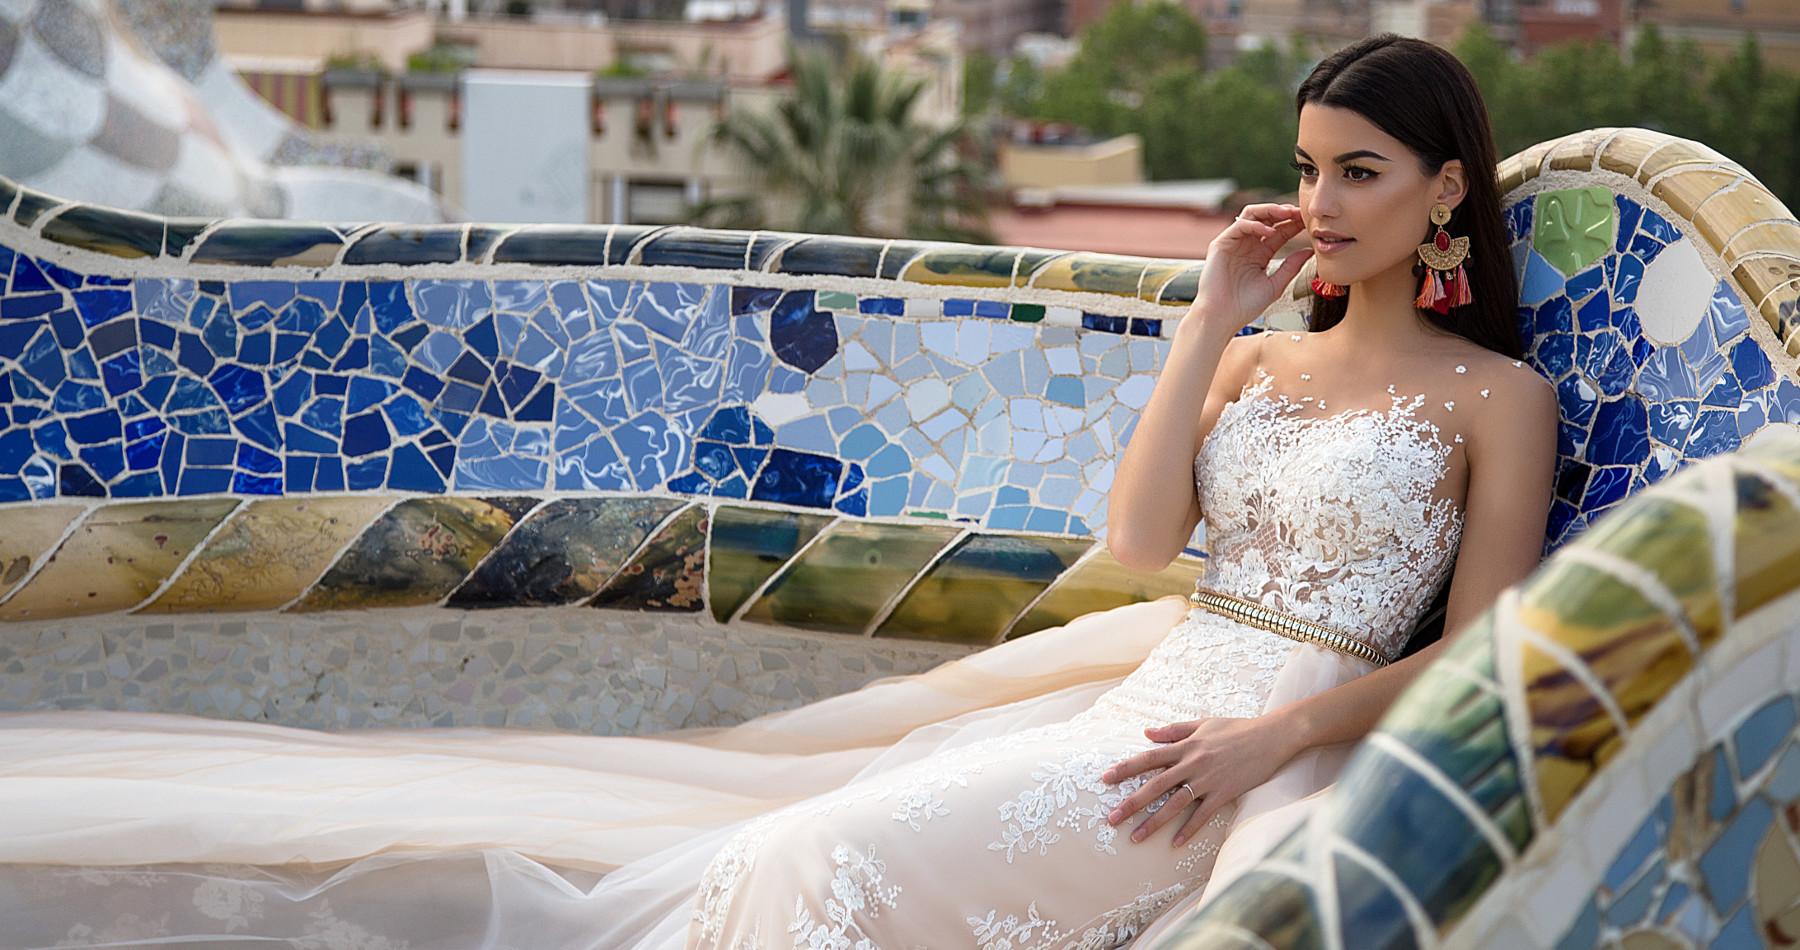 Vestidos de noiva descomplicados: aprenda tudo sobre eles!